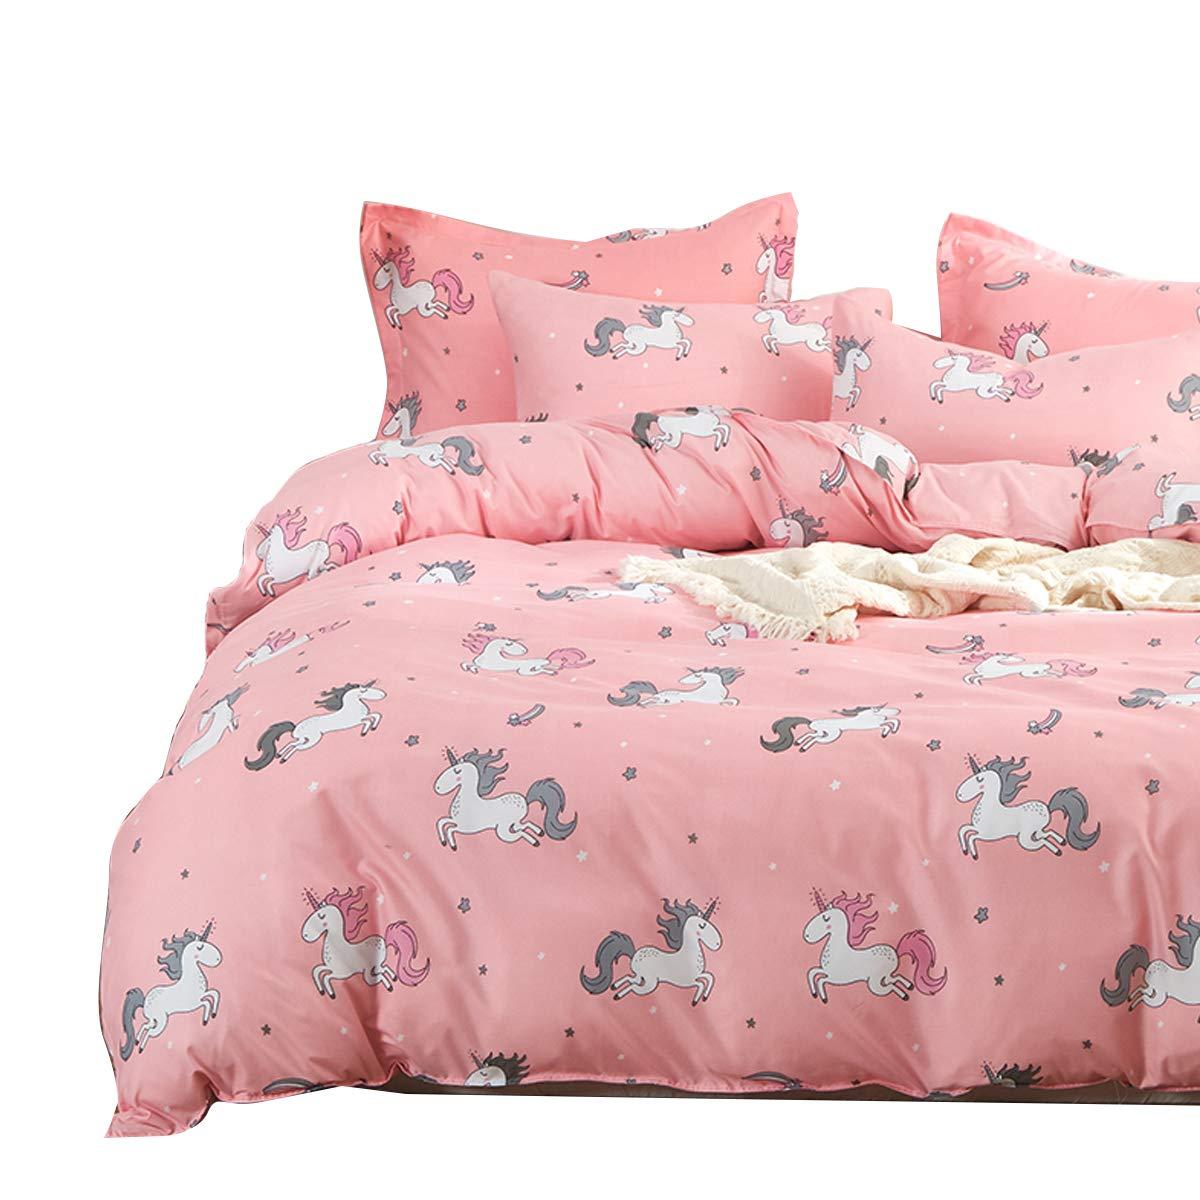 Uozzi Bedding Girls Duvet Cover Set 3 Pieces Twin 68x90 Cute Pattern Bedding Set (1 Pink Unicorn Duvet Cover+2 Pillow Shams) Polyester 800 TC Luxury Hypoallergenic with Zipper Closure, 4 Corner Ties by Uozzi Bedding